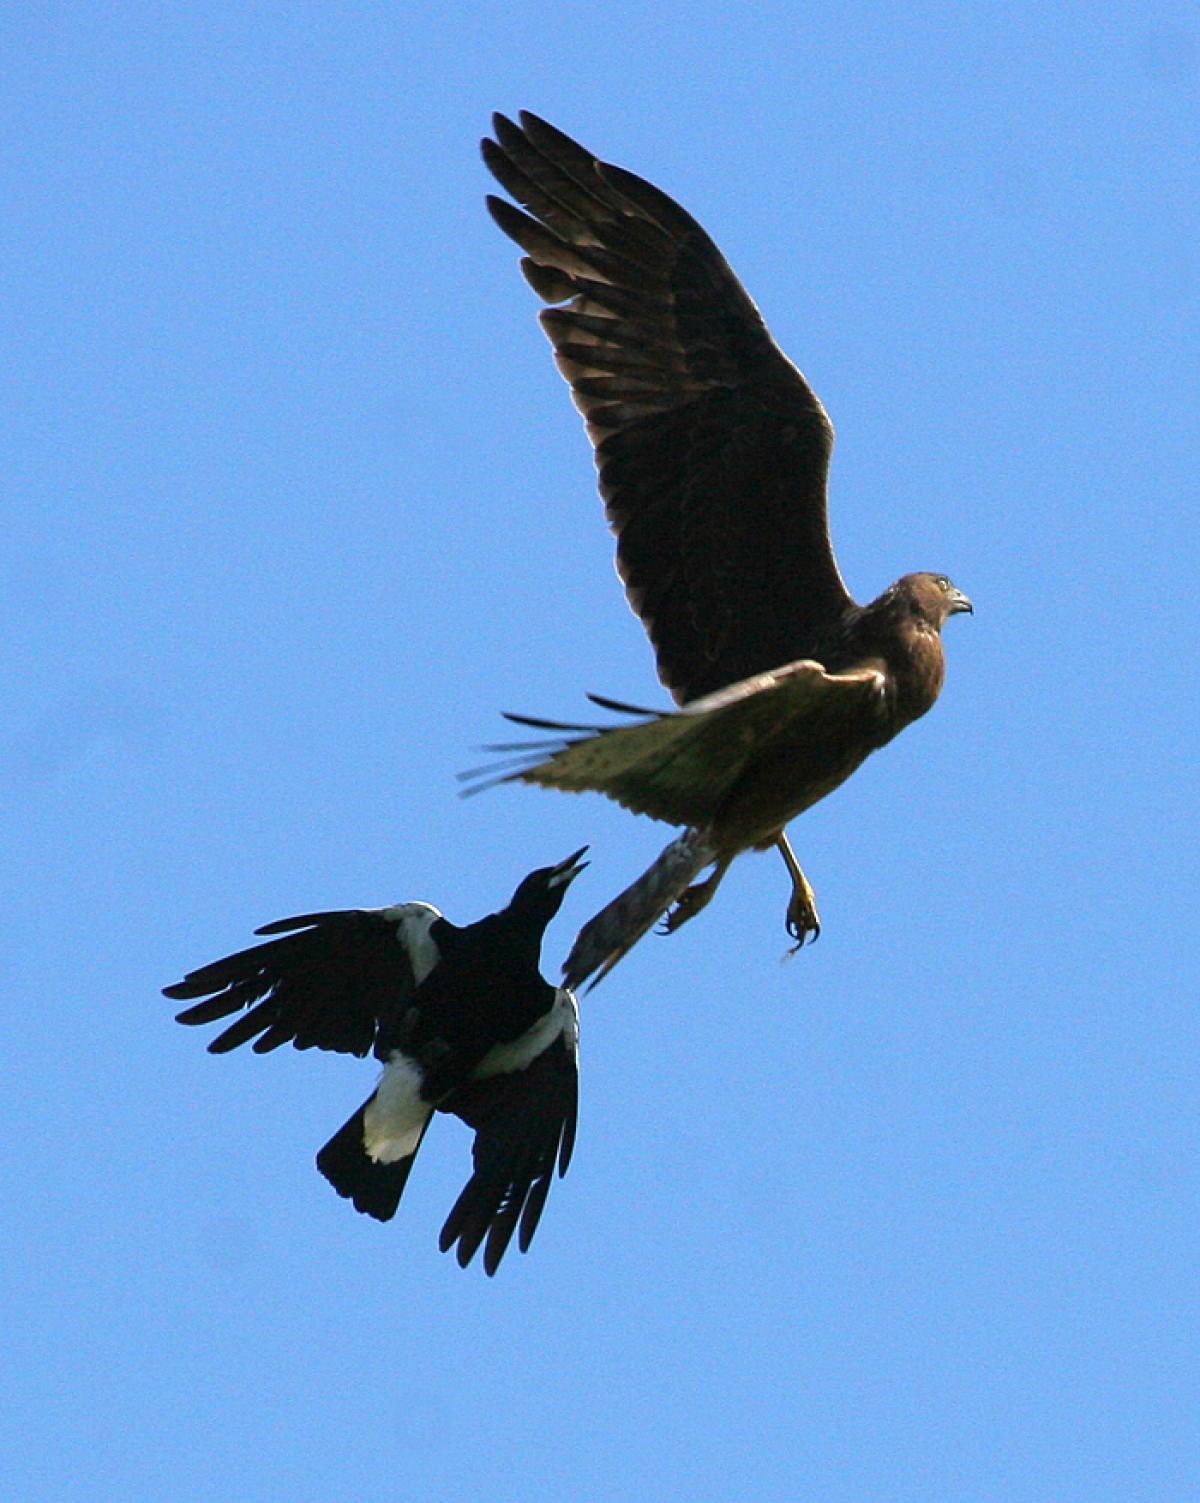 Australian magpie | New Zealand Birds Online - photo#40